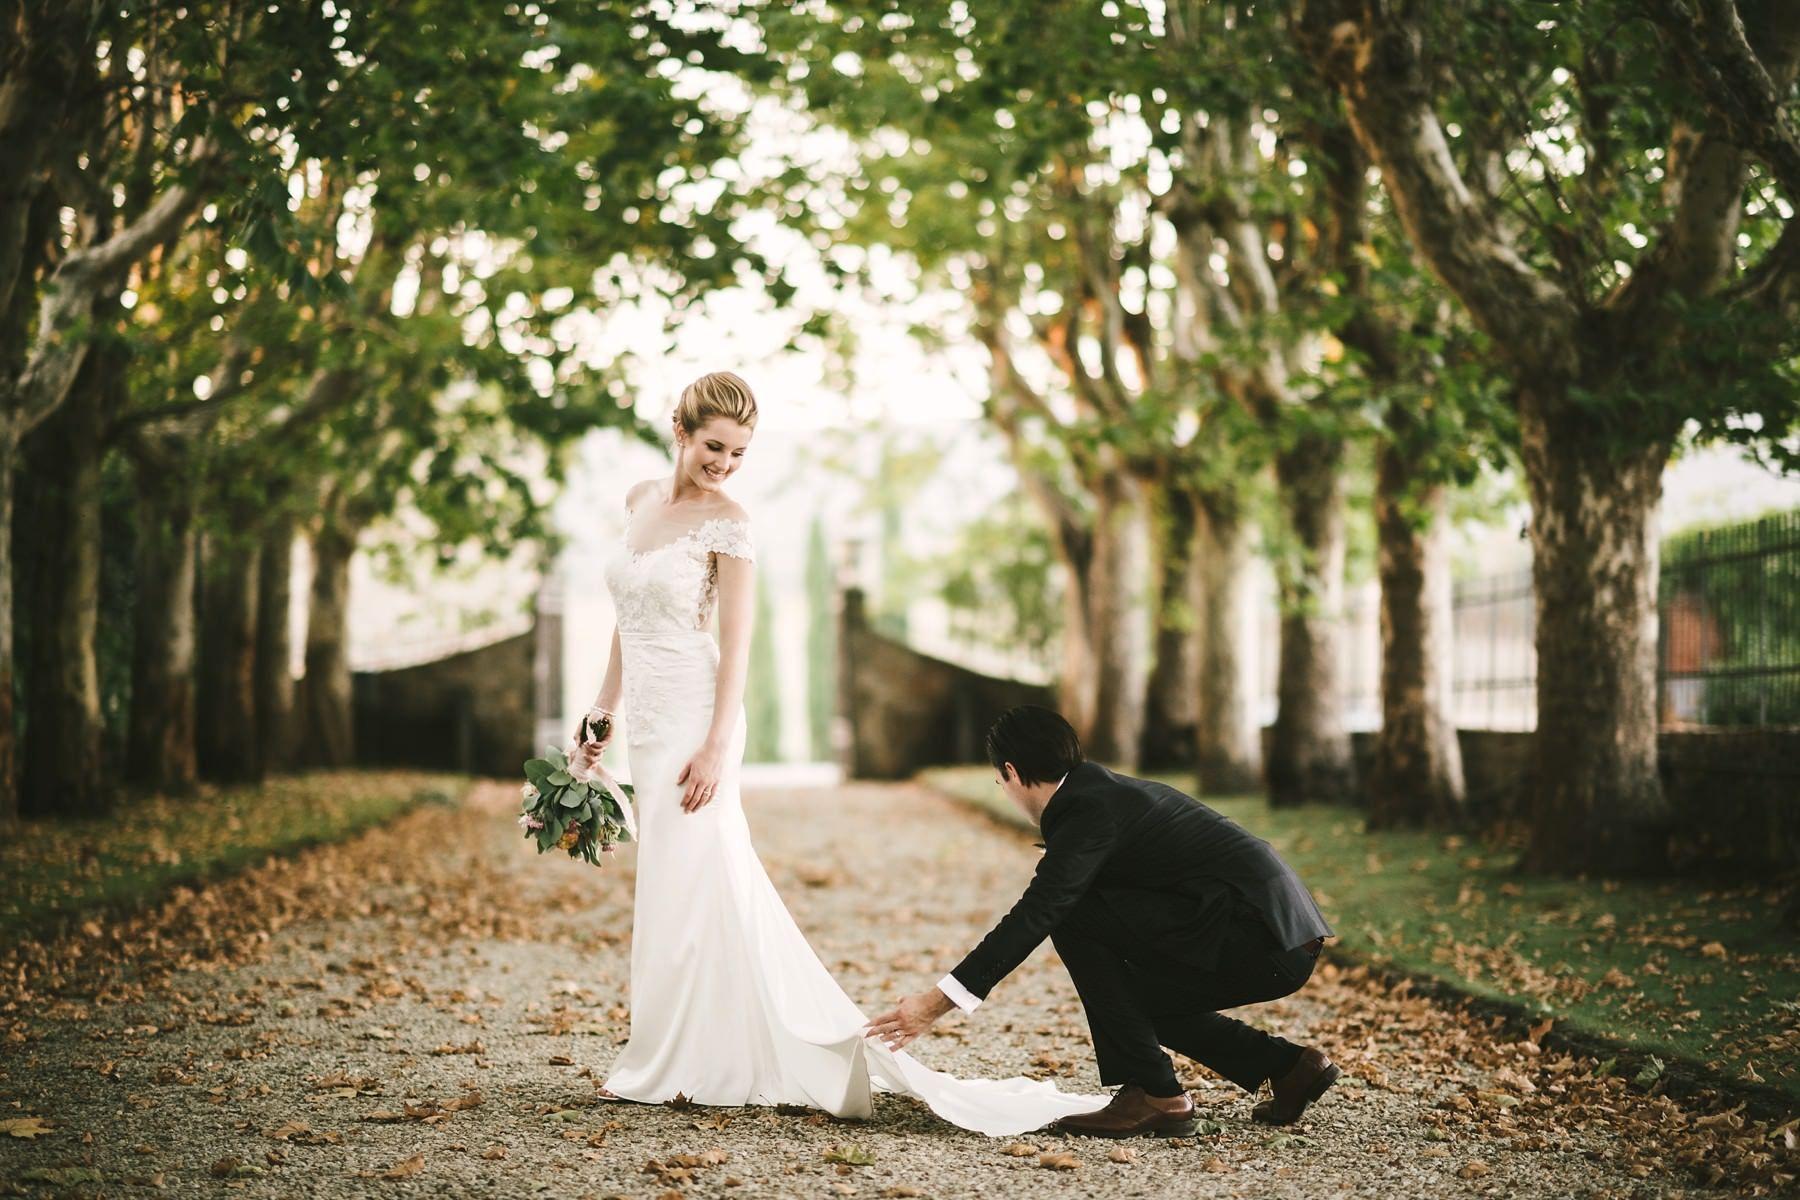 A Wonderful Elopement In Italy Wedding For Two At Villa La Selva Wine Resort Nel 2020